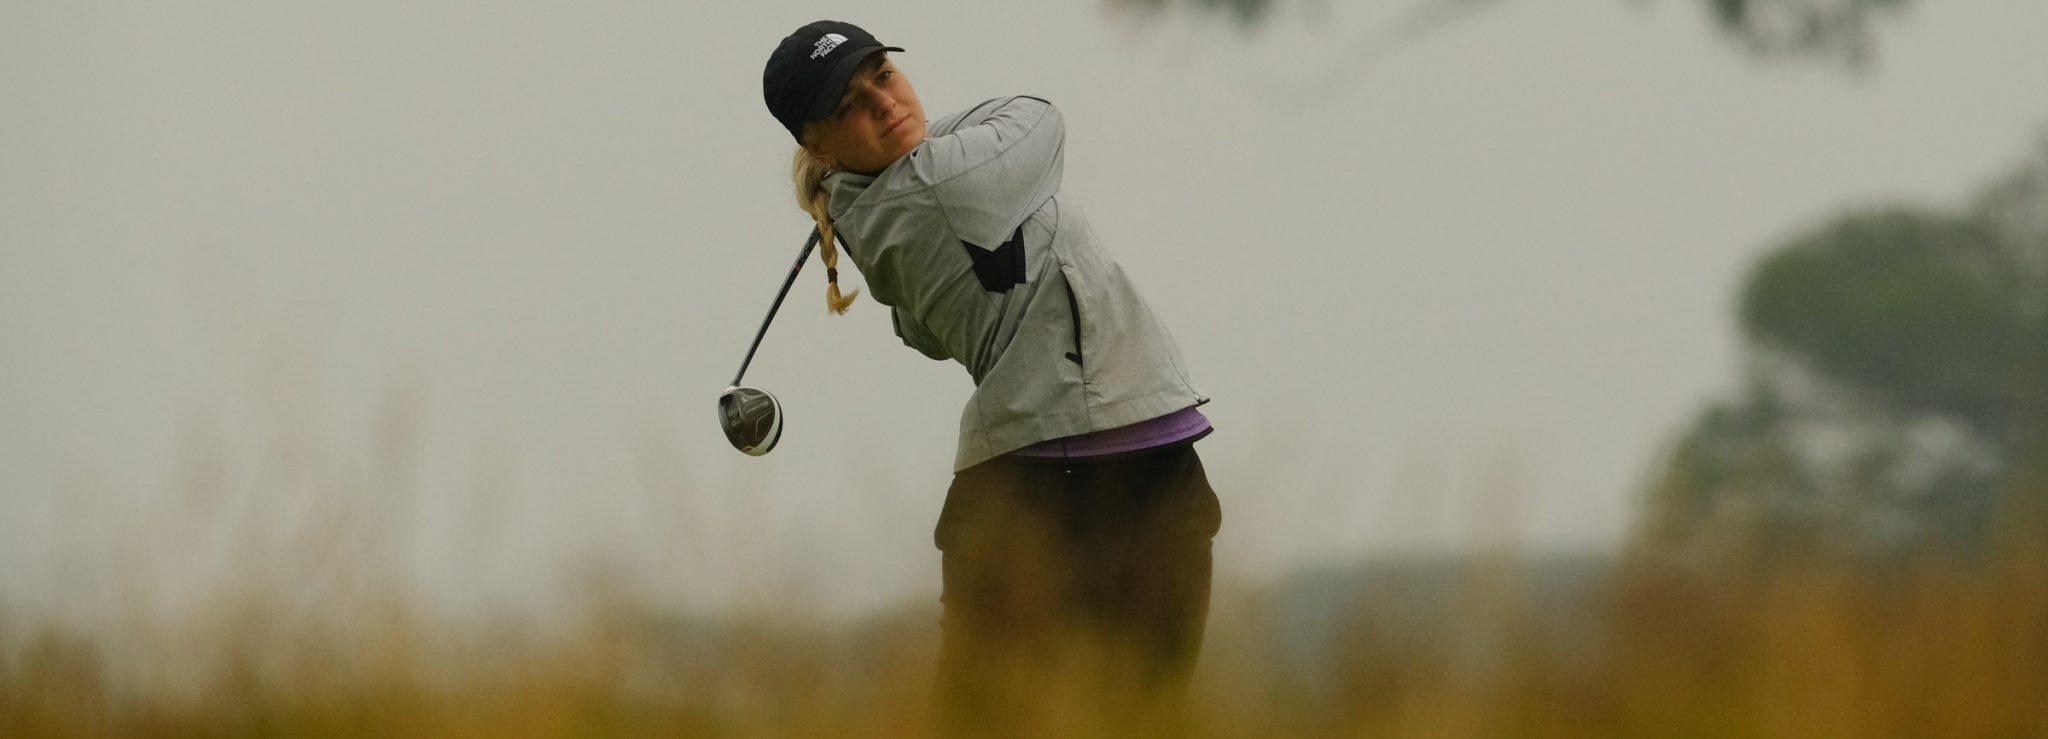 Stephanie Kyriacou in action